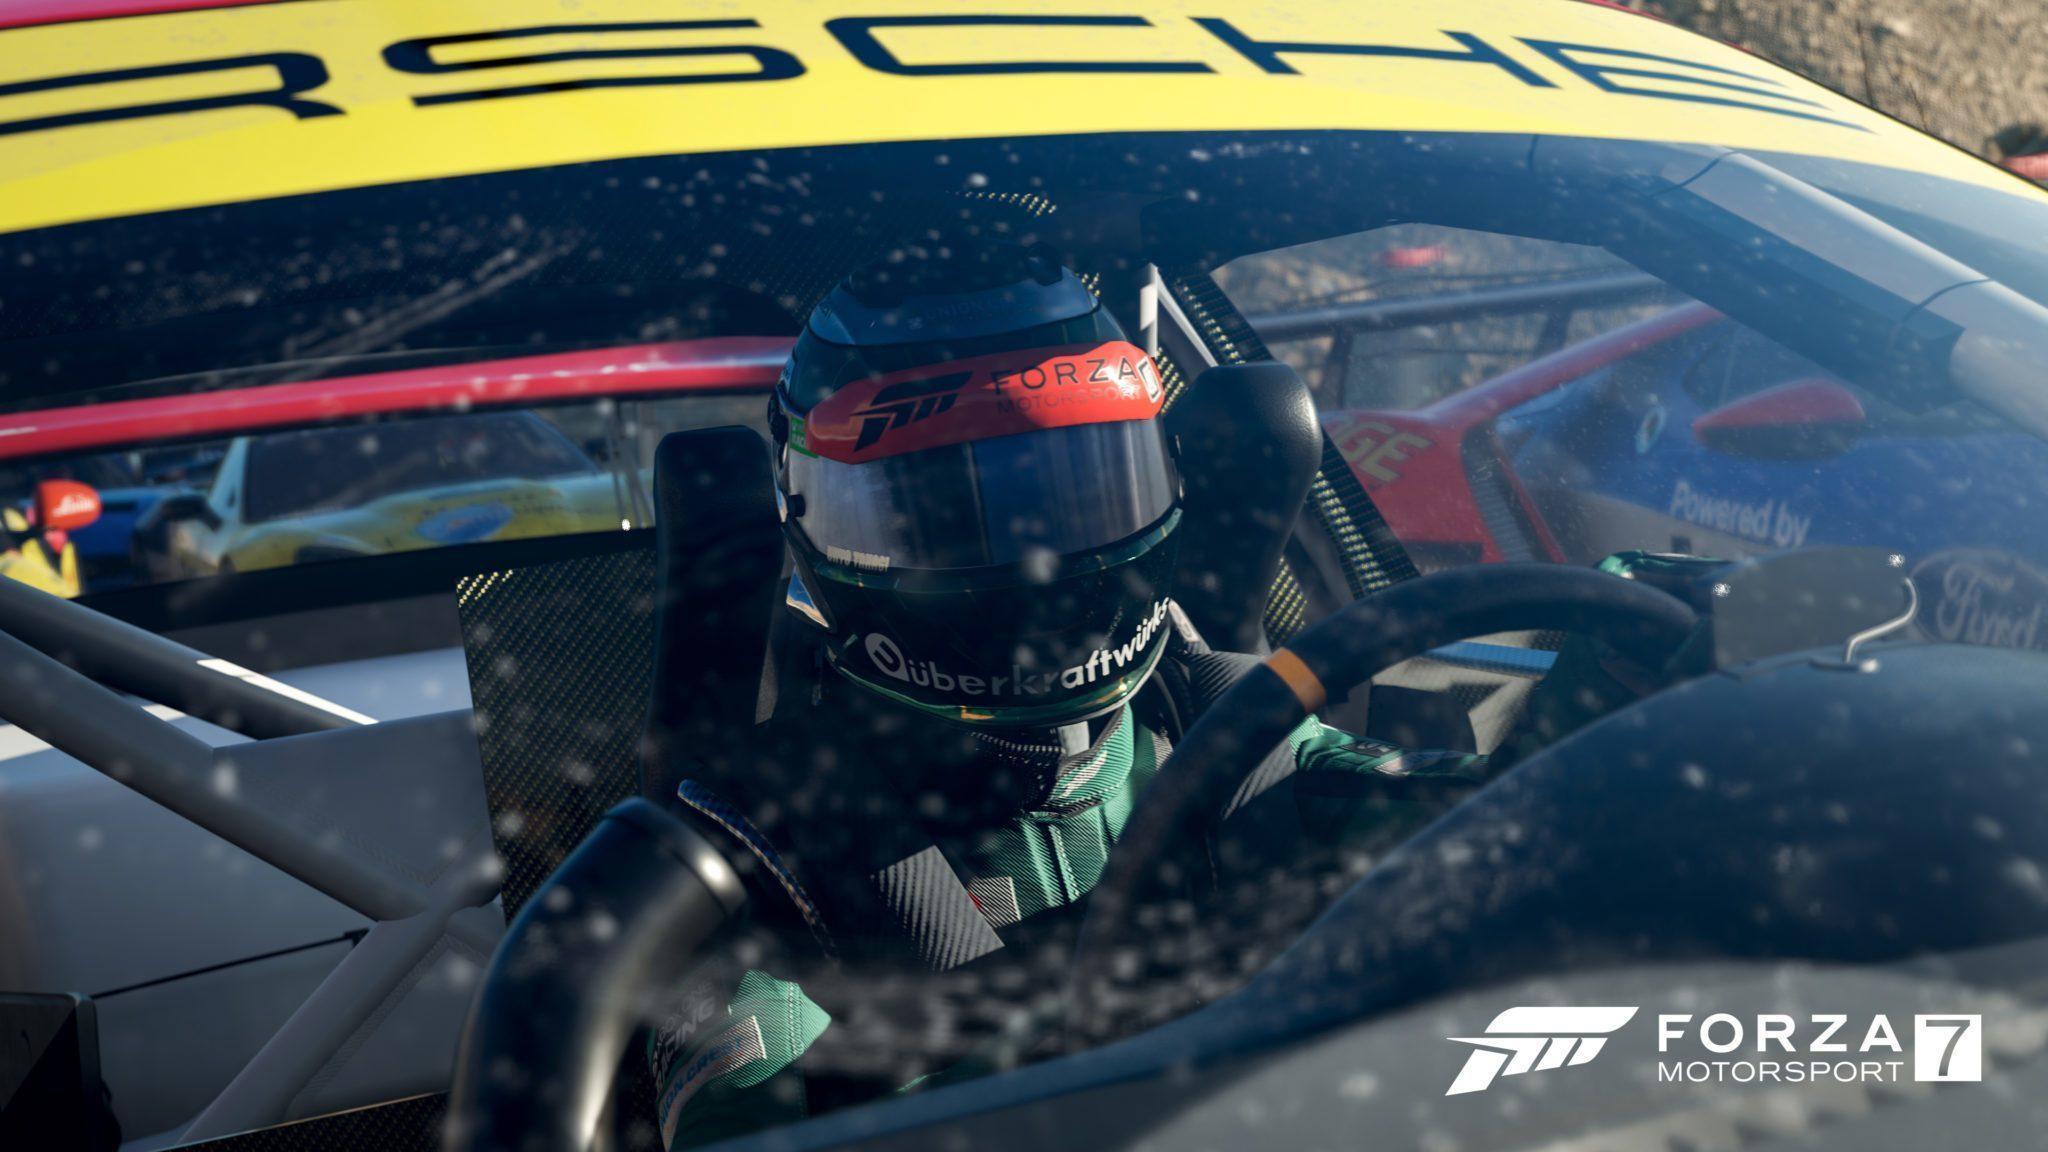 Forza 7 Car Wallpaper Forza Motorsport 7 4k Screenshot Blowout